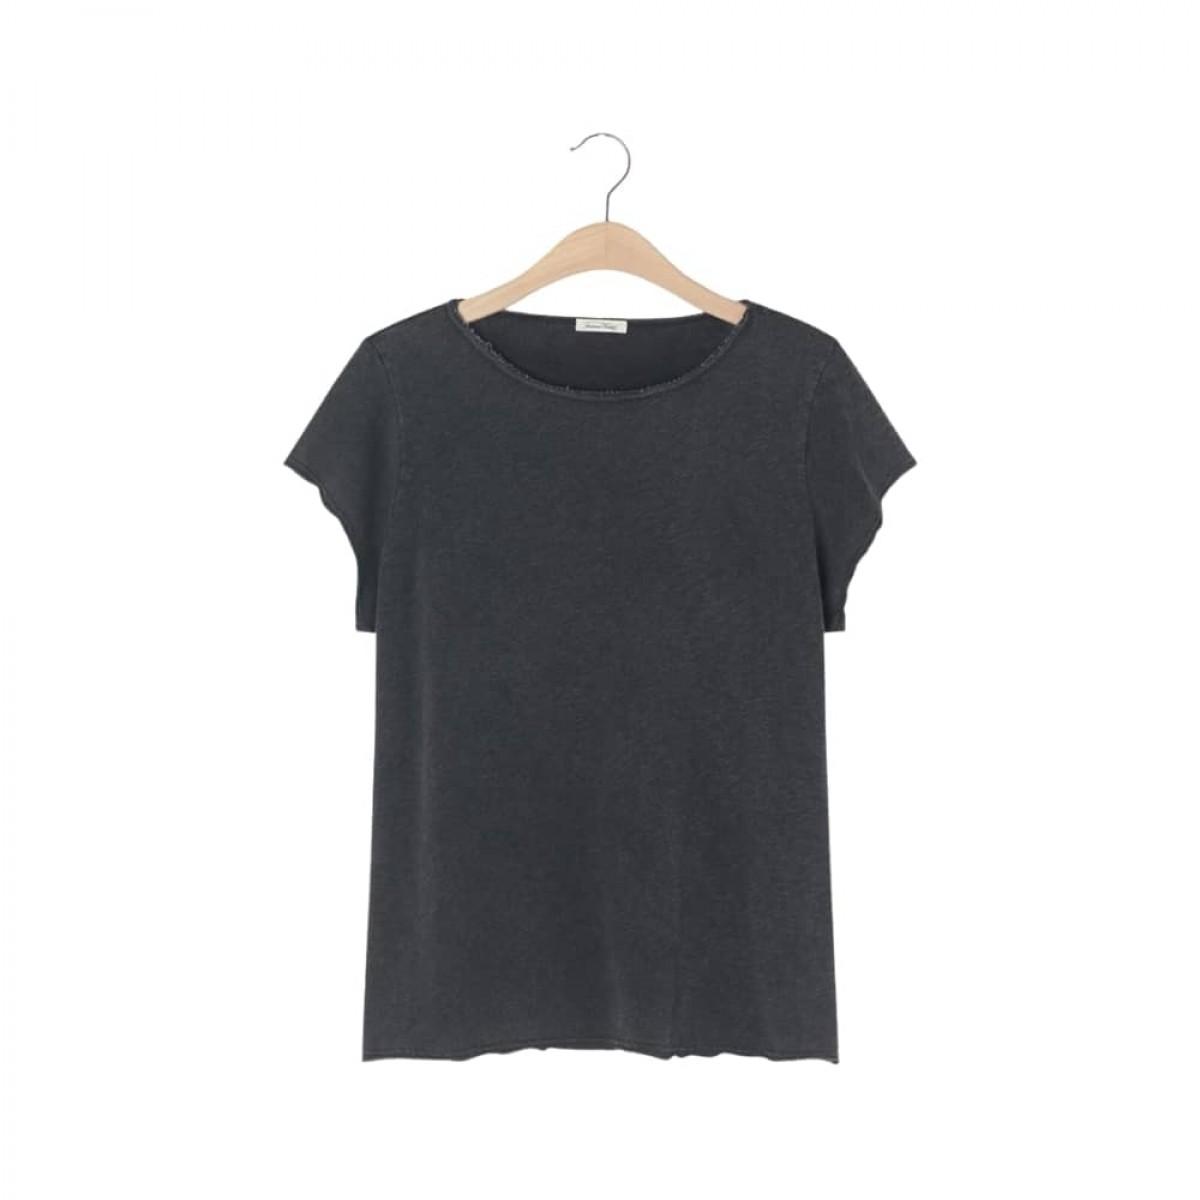 sonoma t-shirt - vintage black